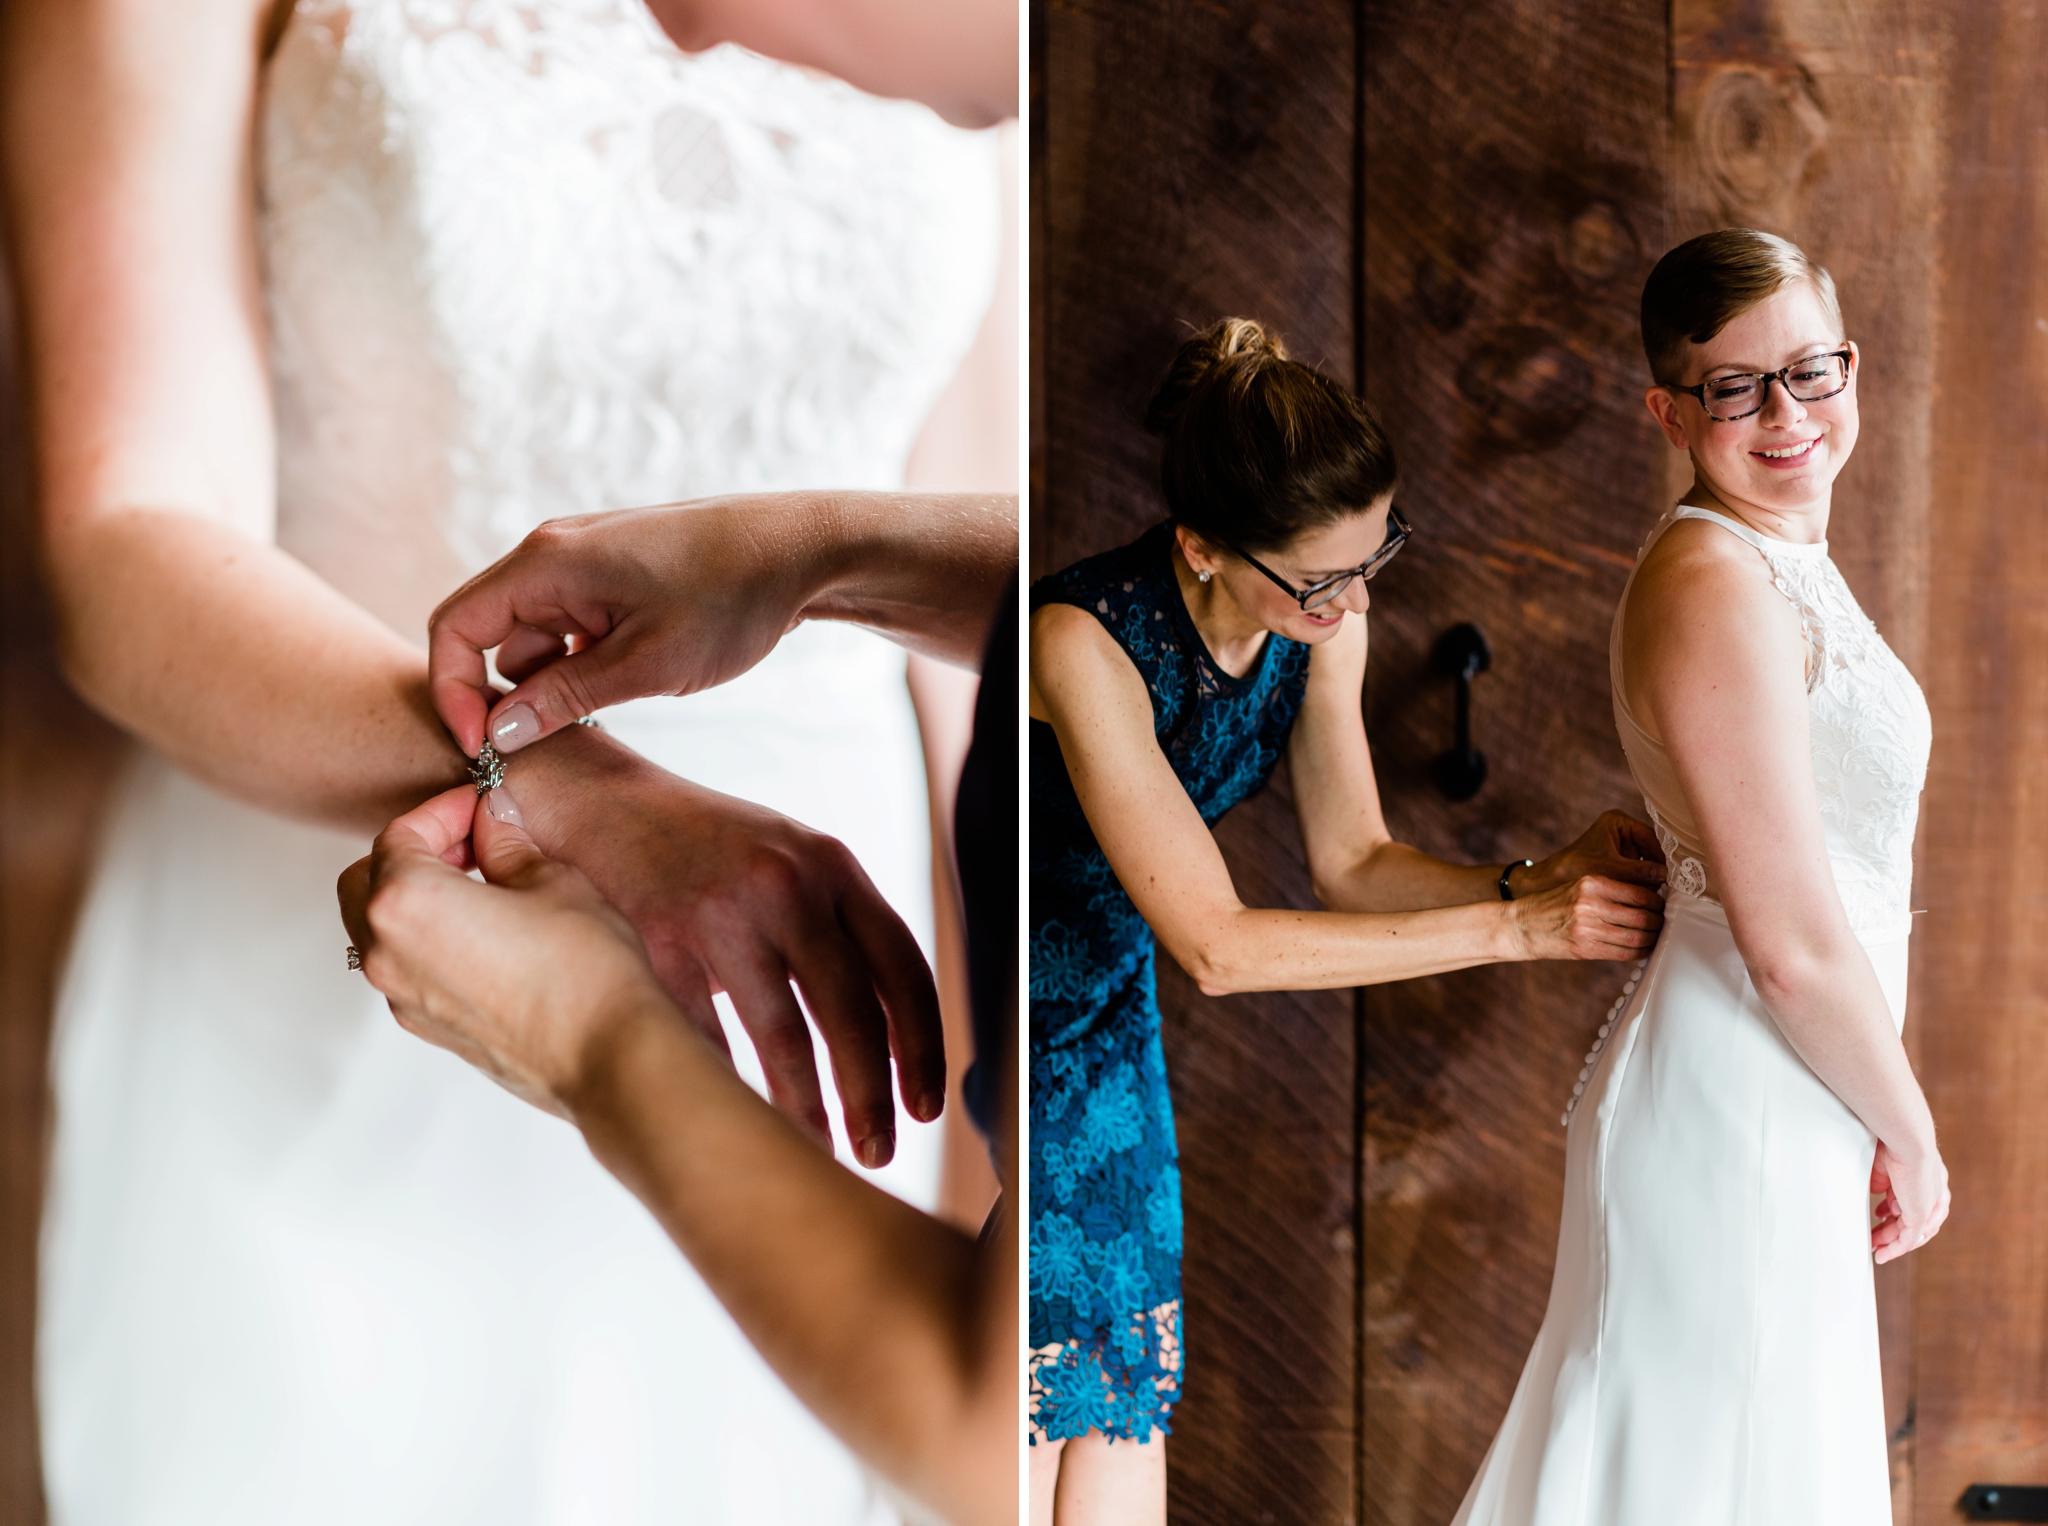 Emily Grace Photography, Lancaster PA Wedding Photographer, The Booking House Wedding Venue, Manheim PA Wedding Venue, Central PA Wedding Photographer